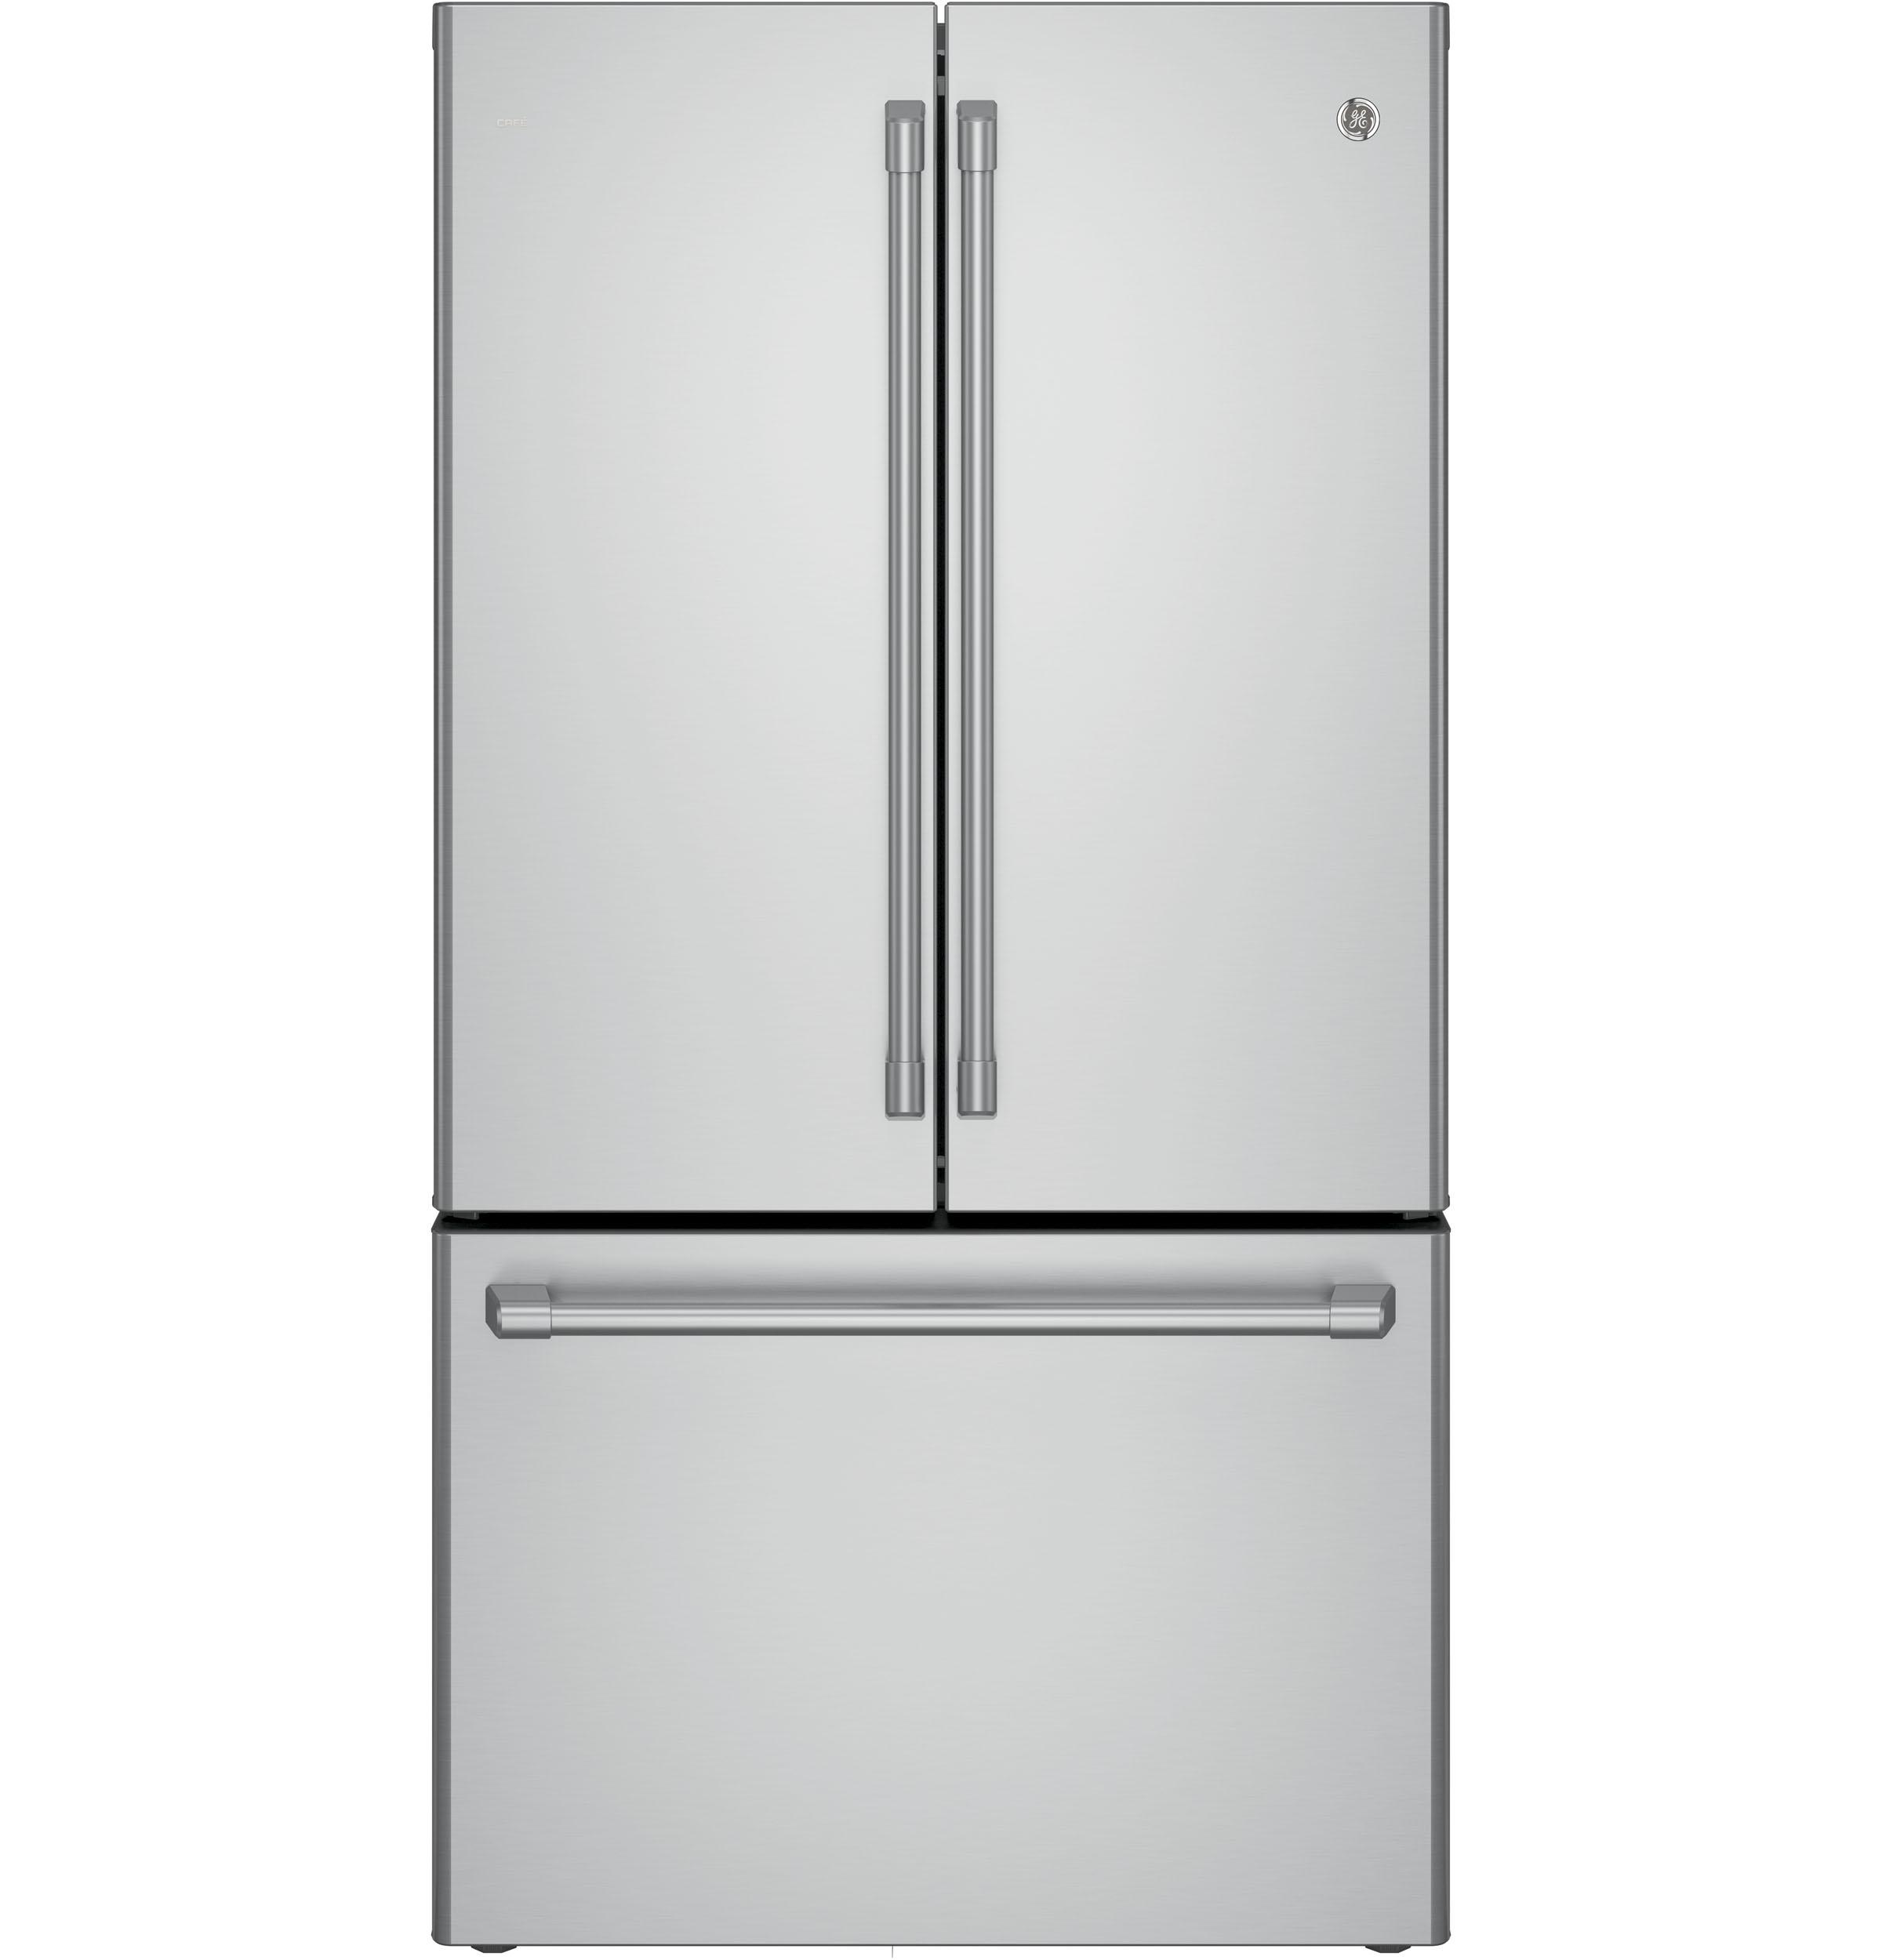 GE Café™ Series ENERGY STAR® 23.1 Cu. Ft. Counter-Depth French-Door Refrigerator